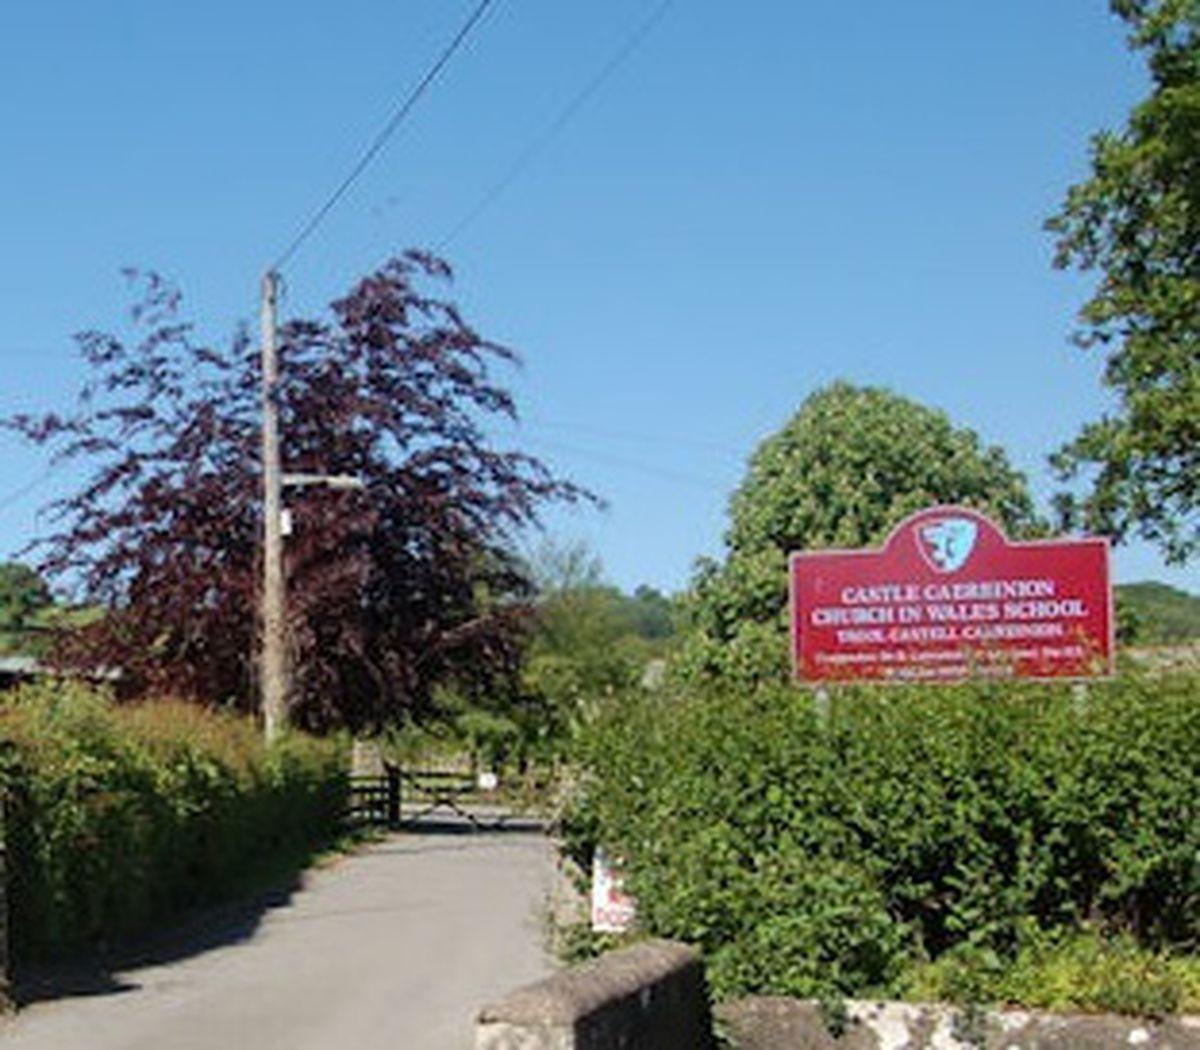 Castle Caereinion School Sign